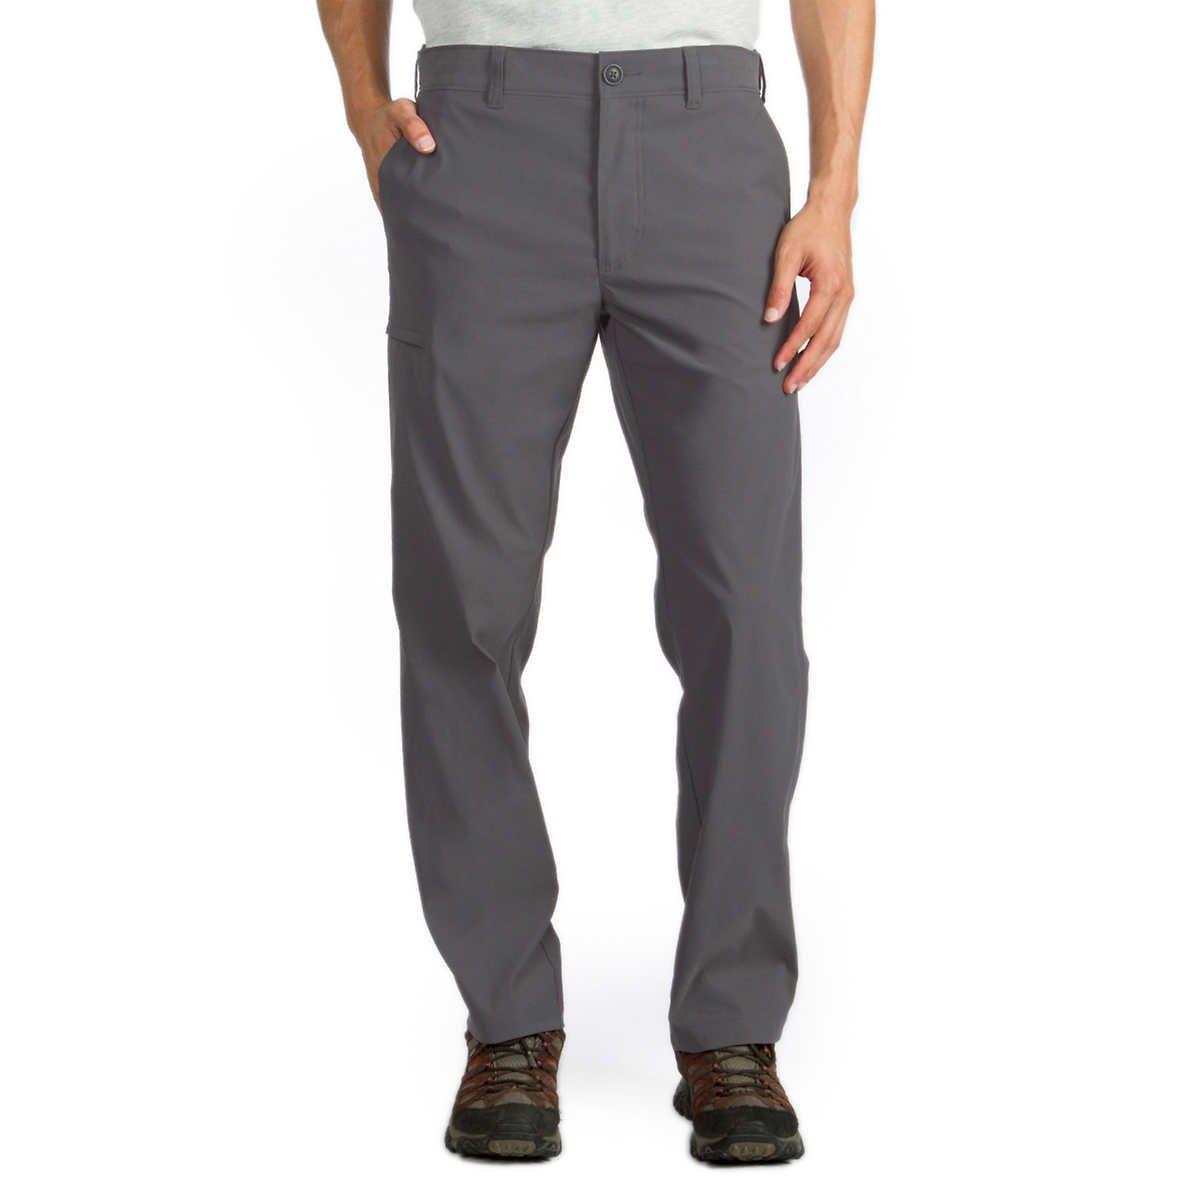 UNIONBAY UB Tech Classic Fit Expandable Comfort Waist Chino Pant for Men (36W x 32L, Grey)